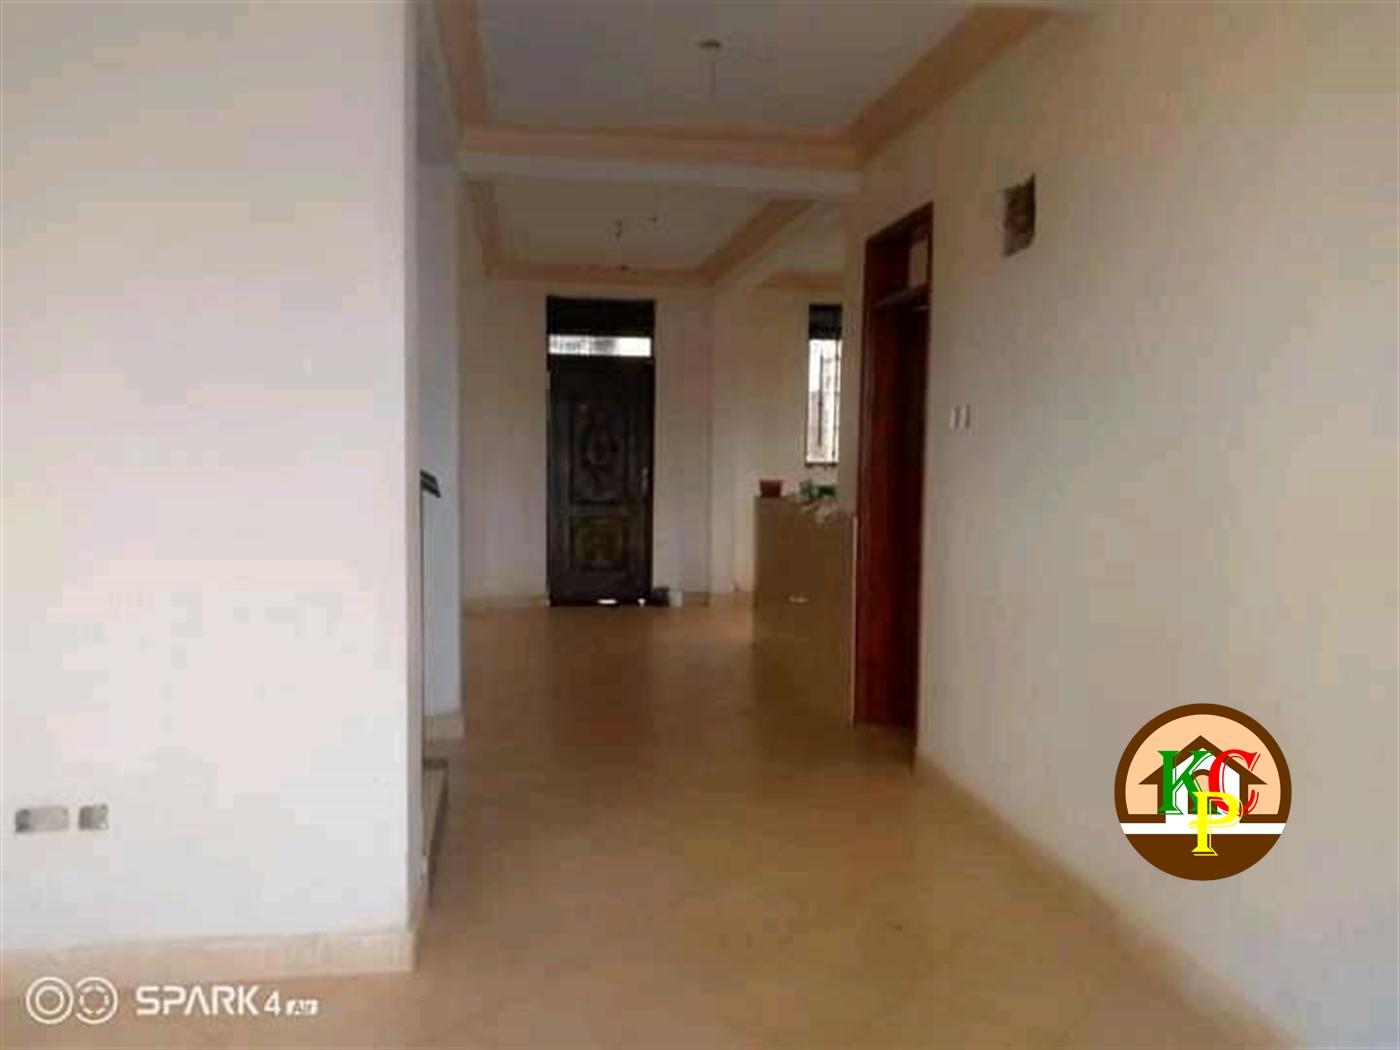 Storeyed house for sale in Nkumba Wakiso